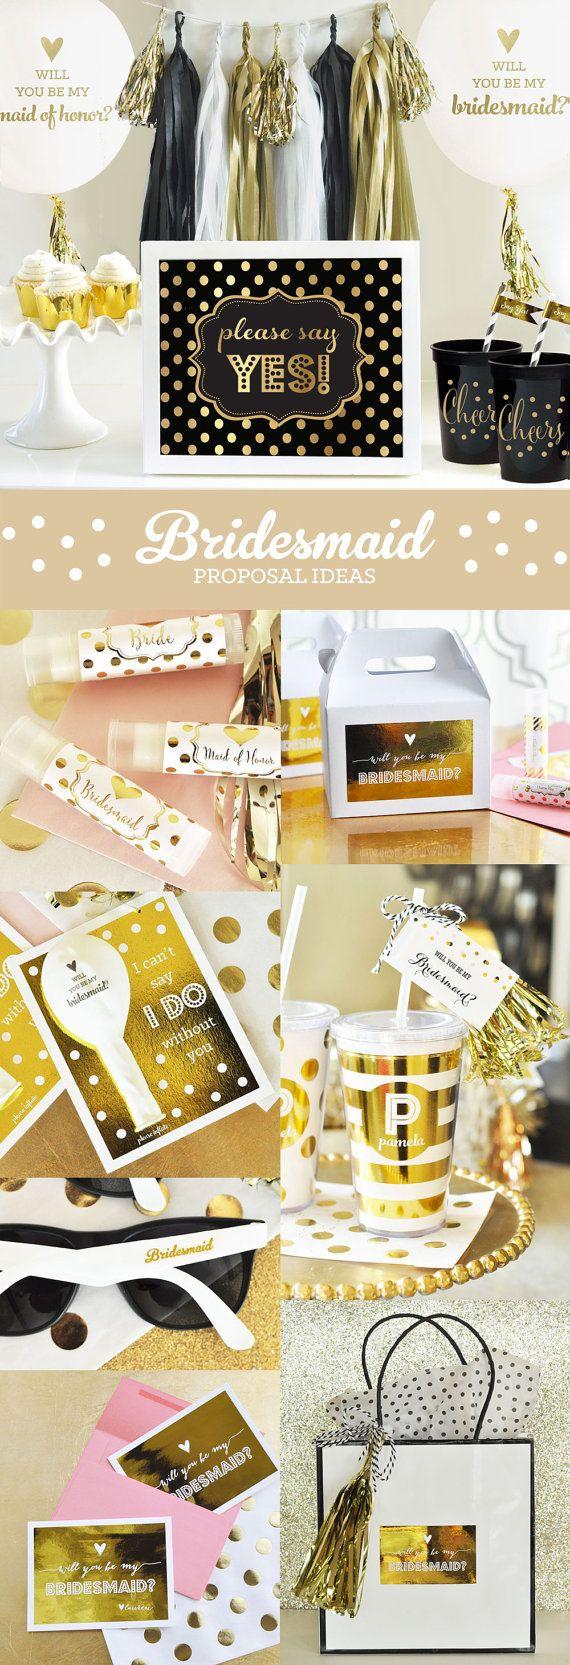 Unique bridesmaid gift ideas cheap - Bridesmaid Gift Ideas Maid Of Honor Gifts For Cheap Unique Bridesmaid Gift Ideas Like